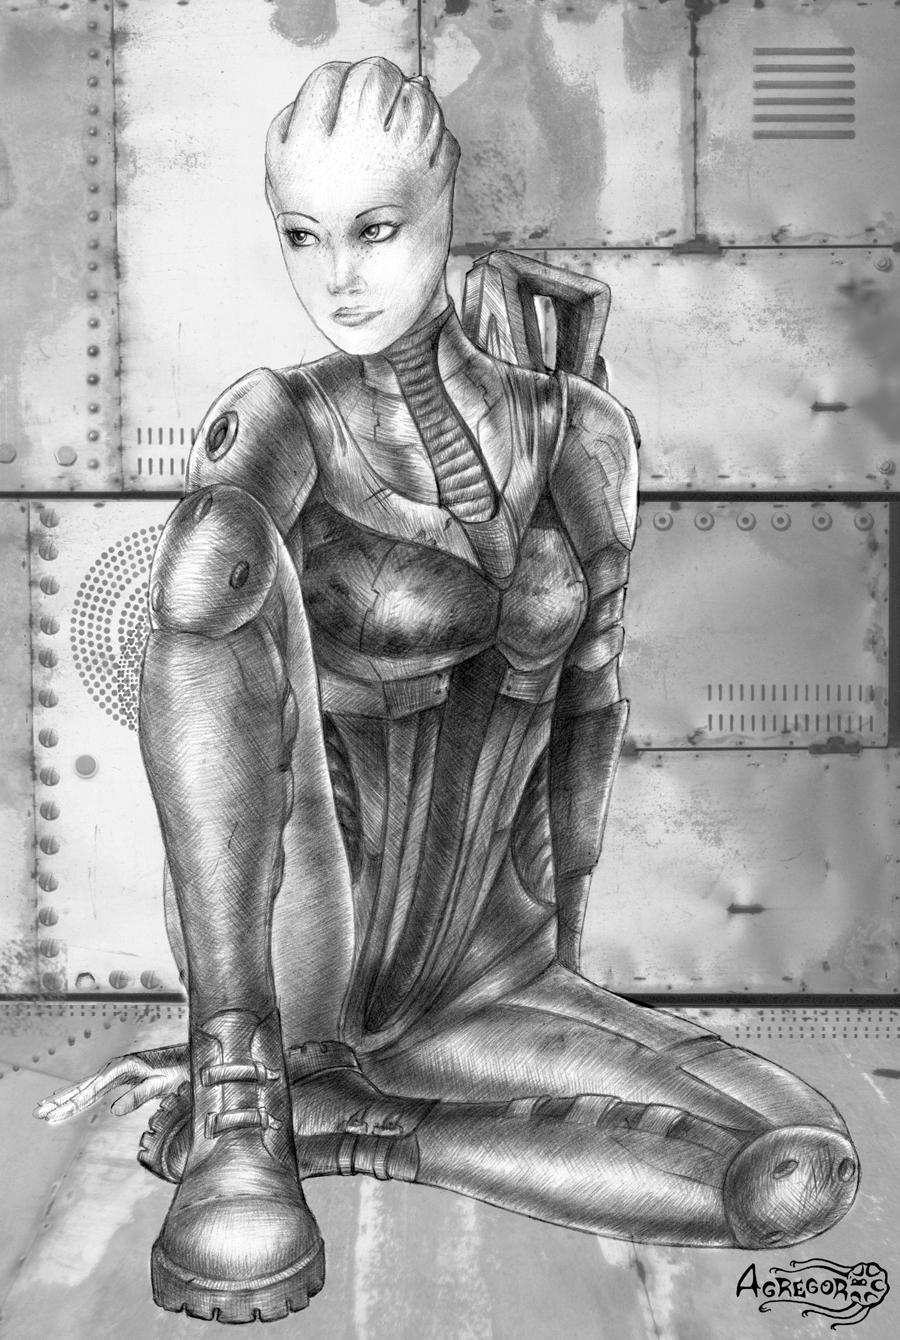 Mass Effect 2 Battle Liara by Agregor